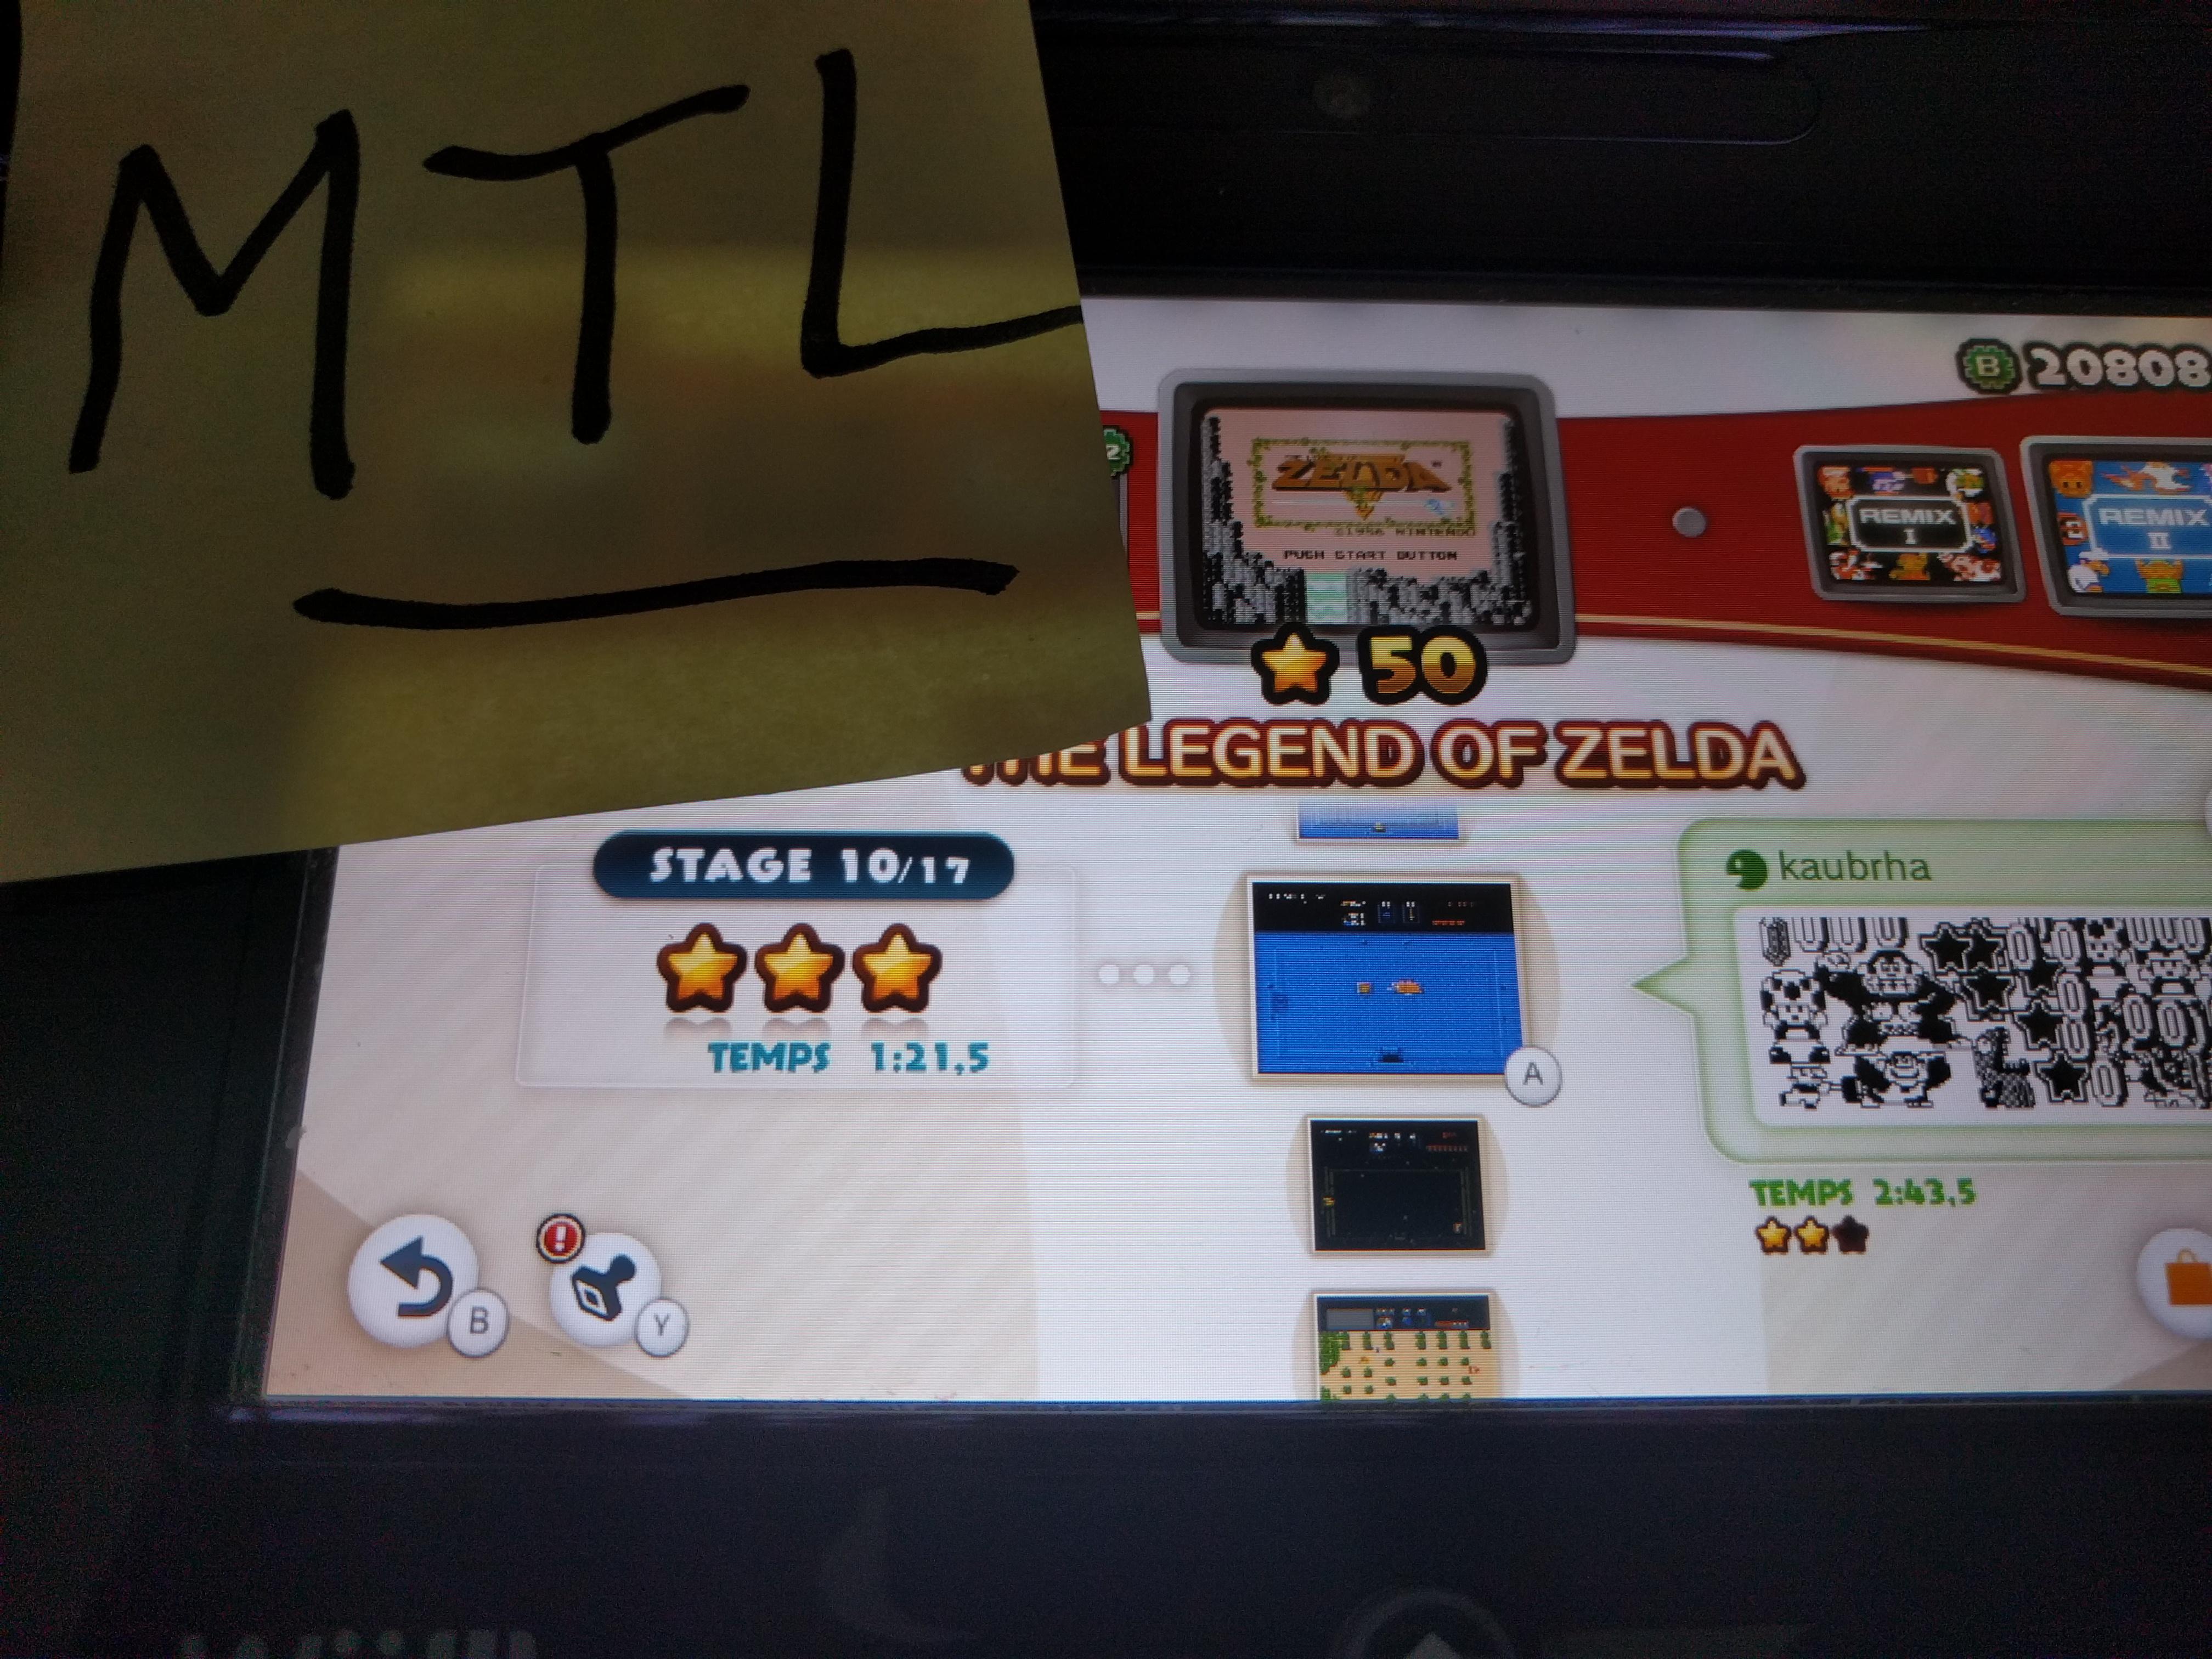 Mantalow: NES Remix: The Legend of Zelda: Stage 10 (Wii U) 0:01:21.5 points on 2016-06-10 05:43:17